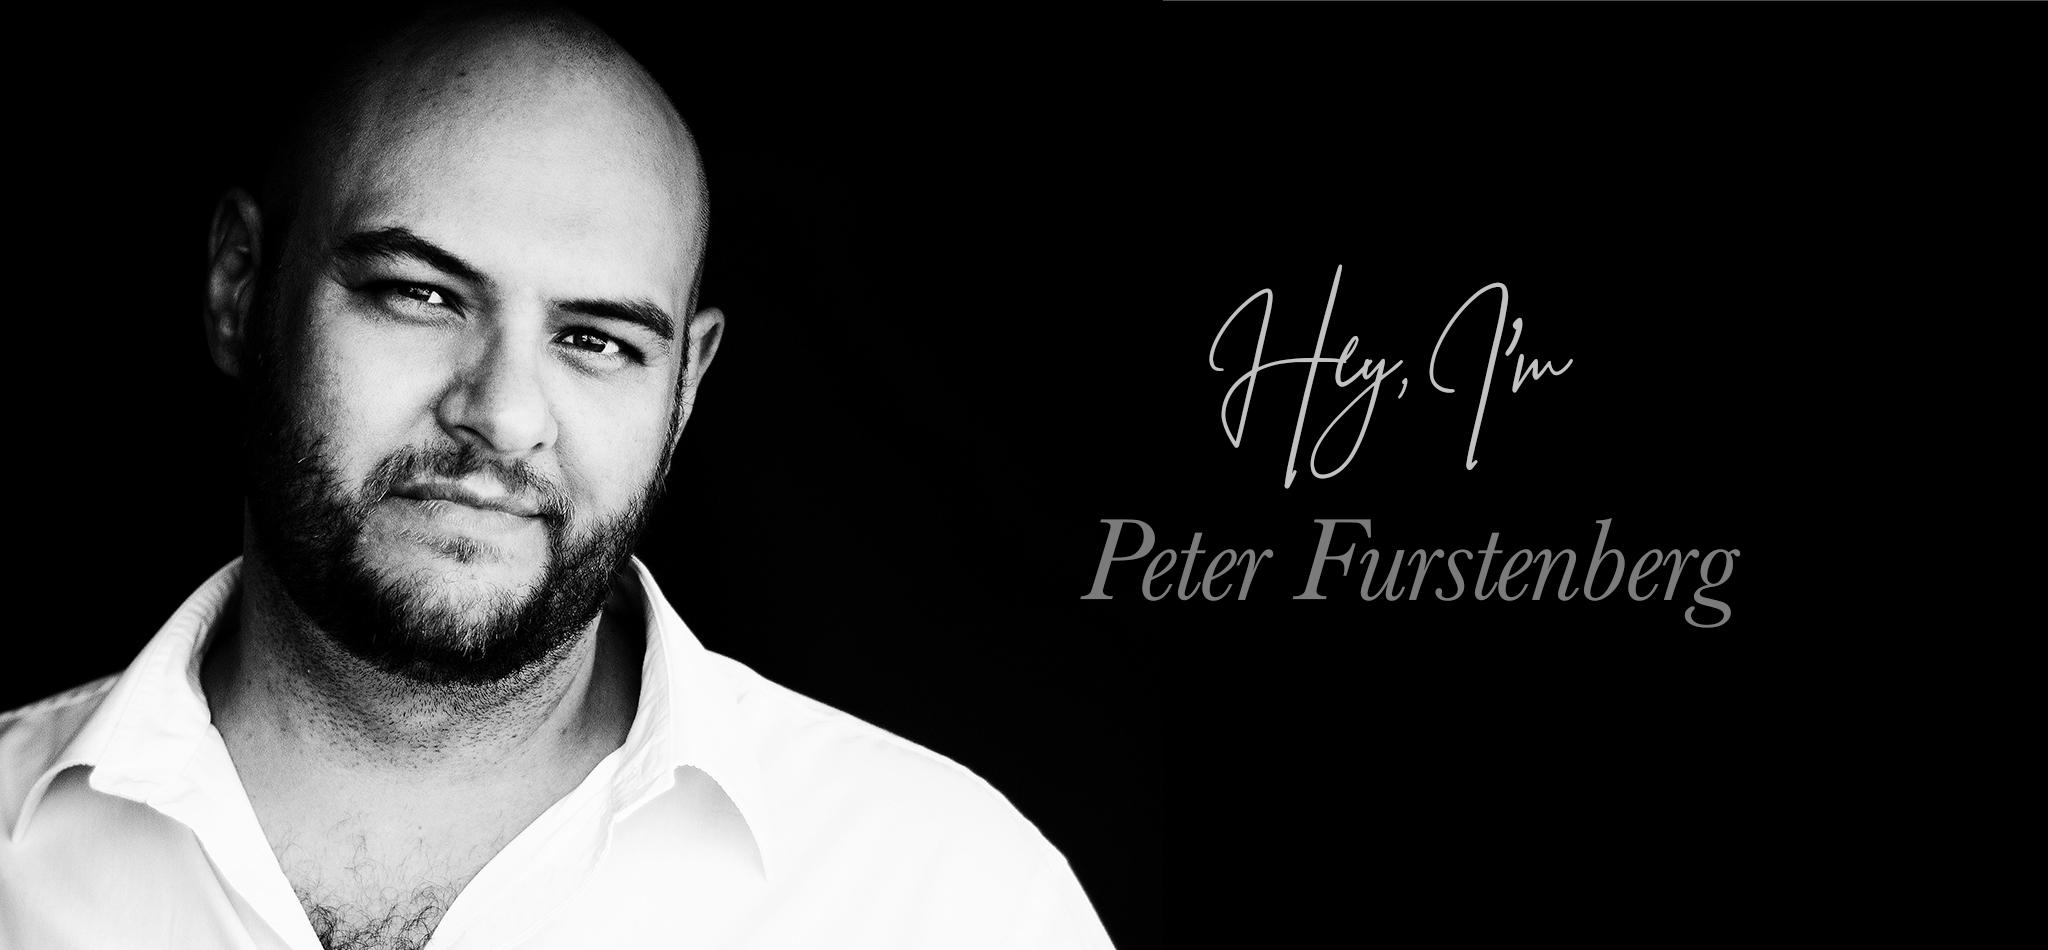 Peter Furstenberg